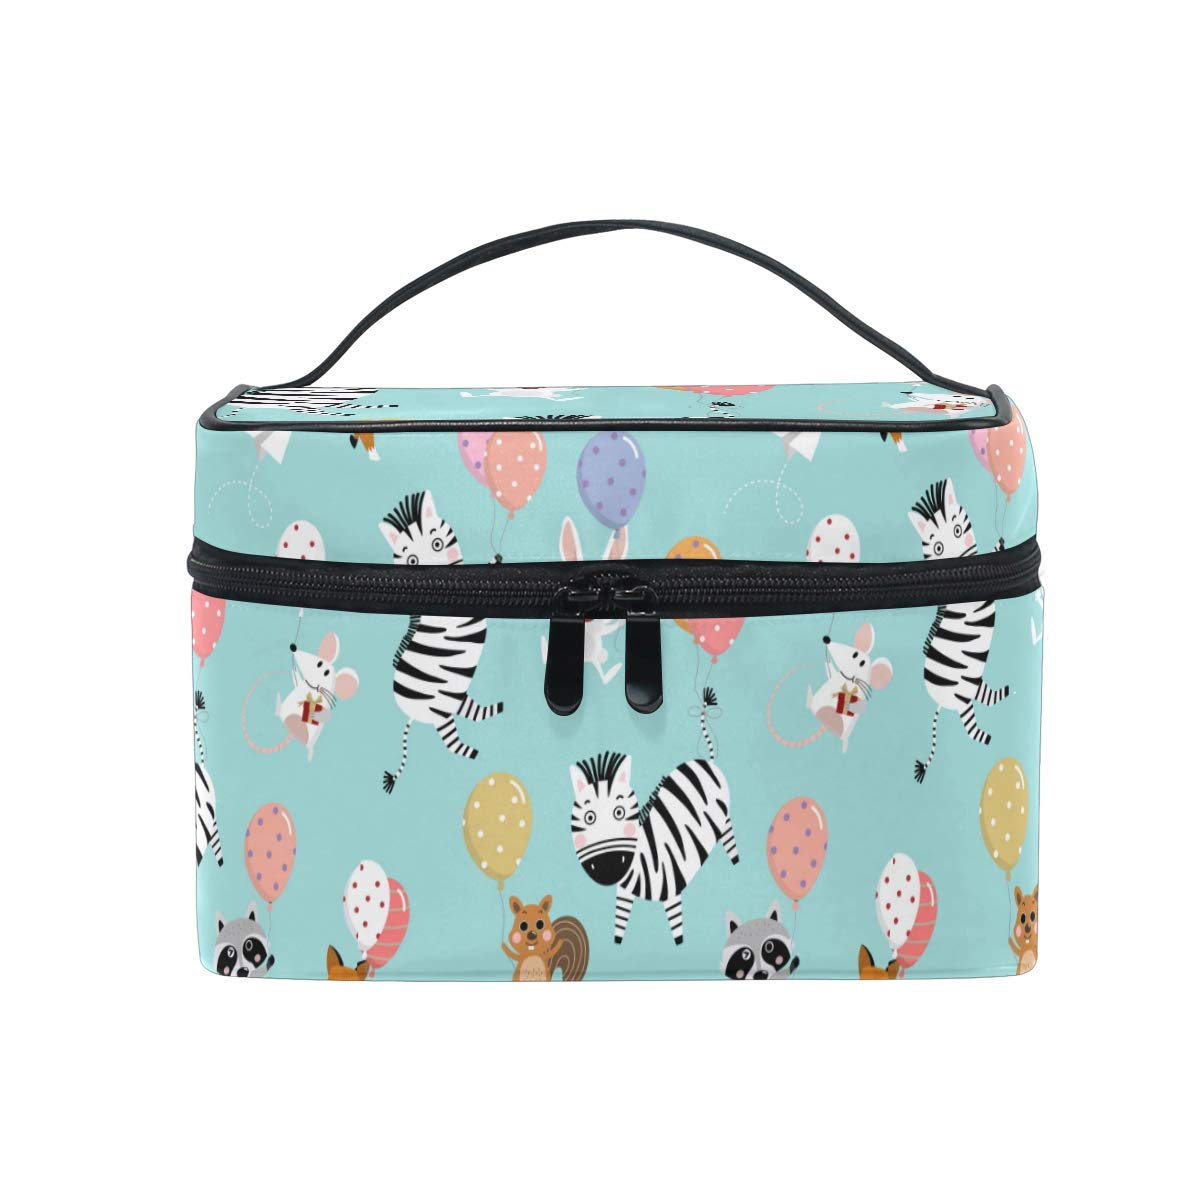 Cute Zebra Squirrel Balloons Women Makeup Bag Travel Cosmetic Bags Toiletry Train Case Beauty Pouch Organizer